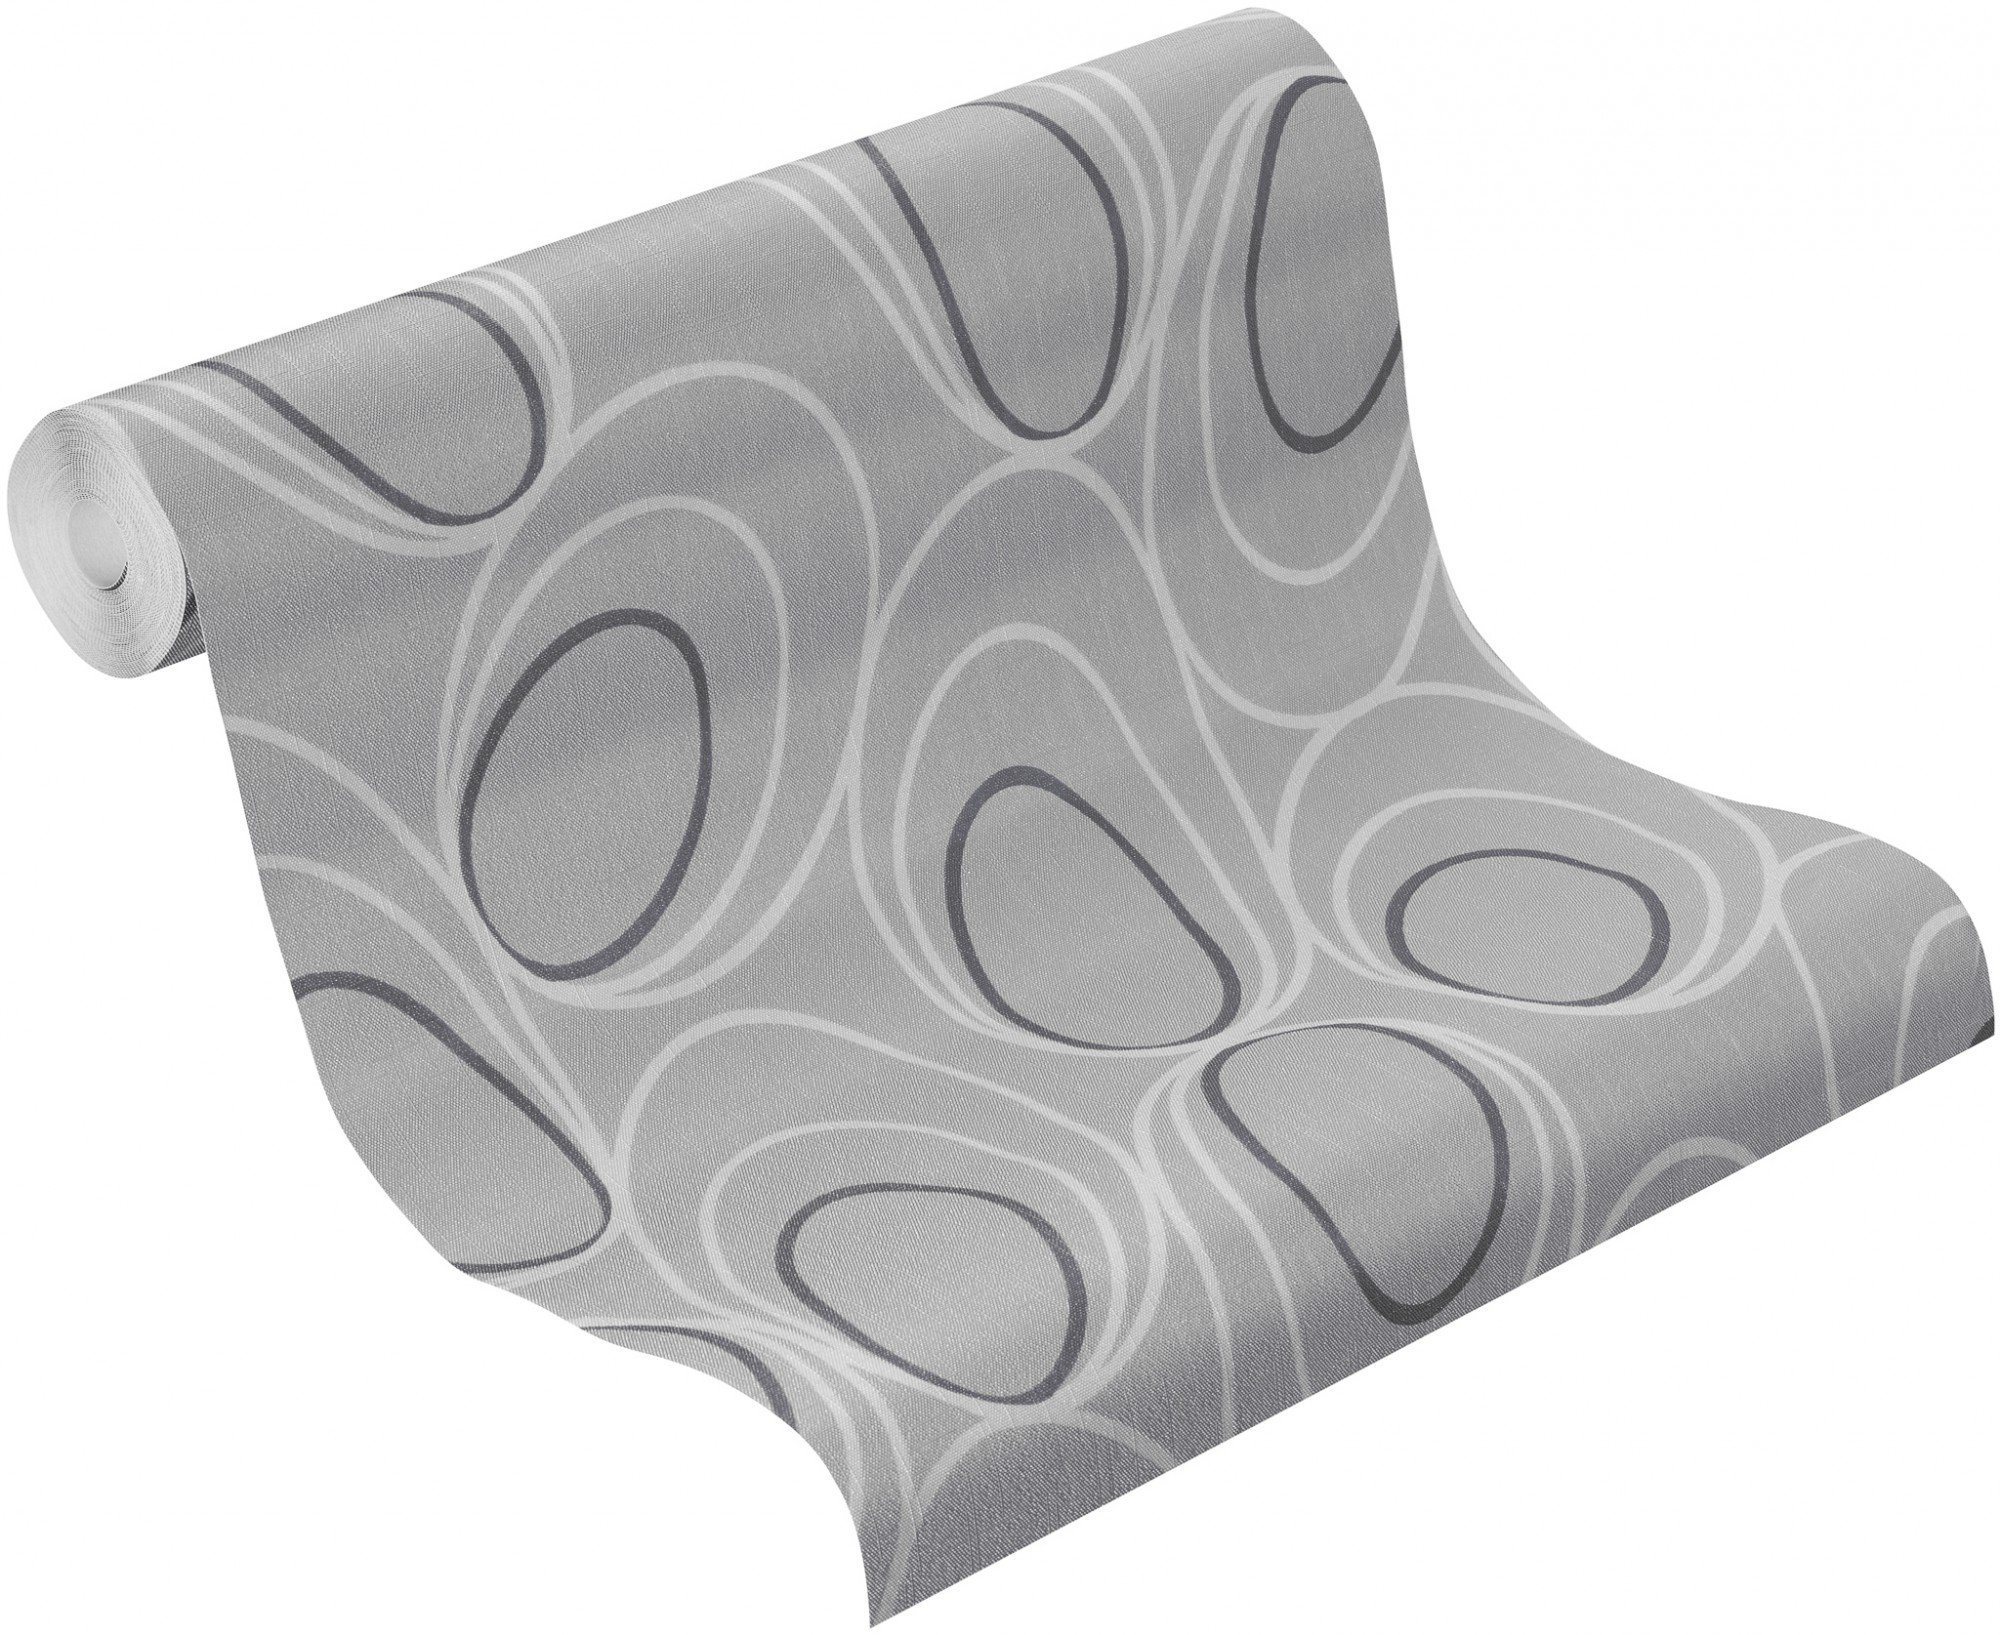 Barbara Becker Tapeten Deco Chic : Rasch Tapete Deco Chic Vliestapete 728415 Design modern silber grau